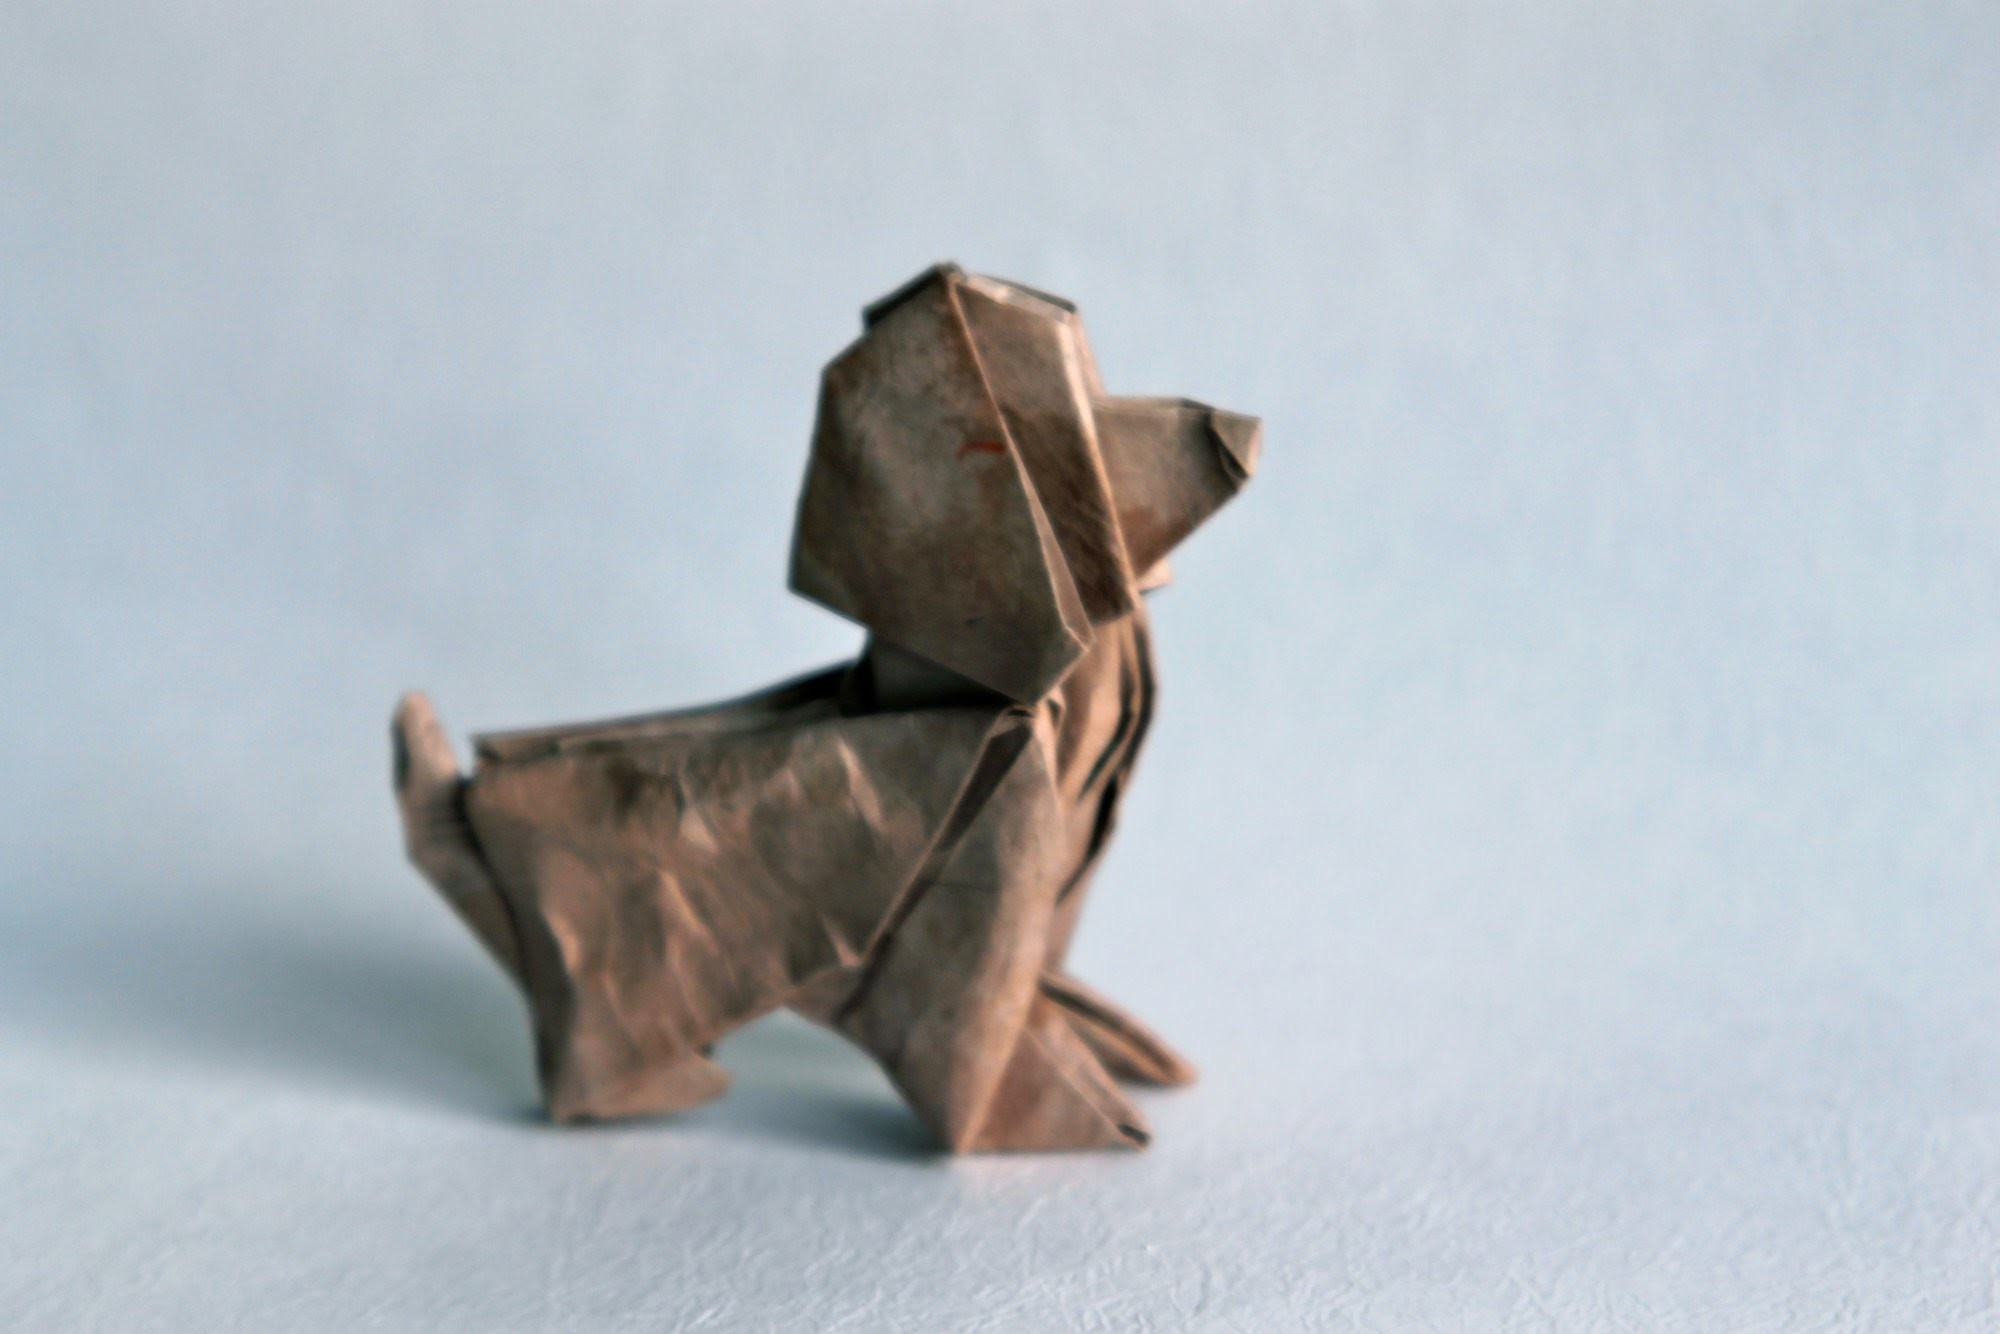 how to make origami fortune teller jeremy shafer